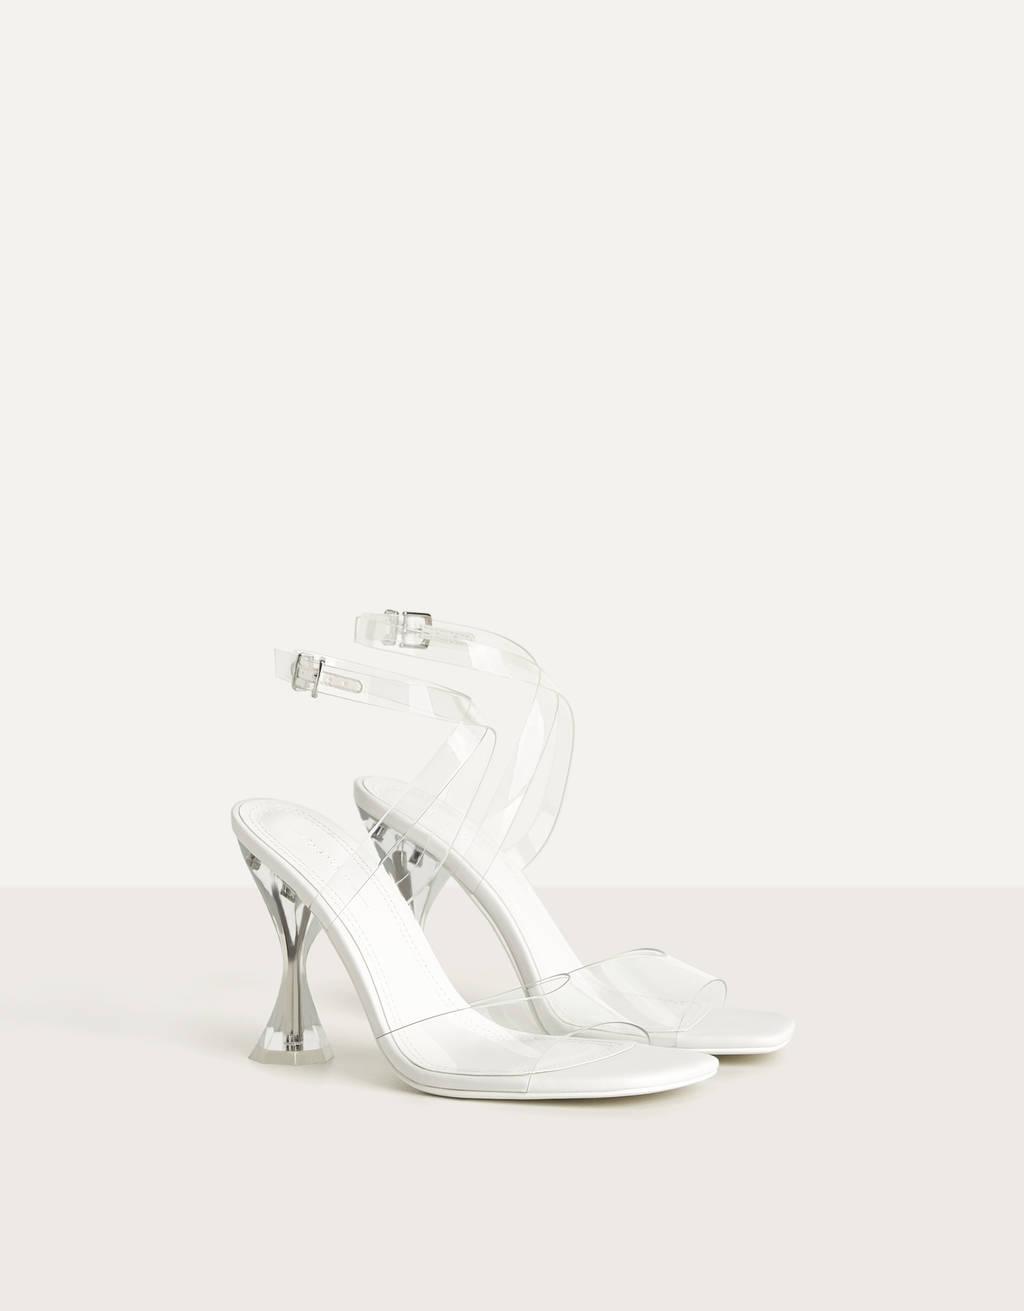 High-heel sandals with vinyl straps and methacrylate heels.